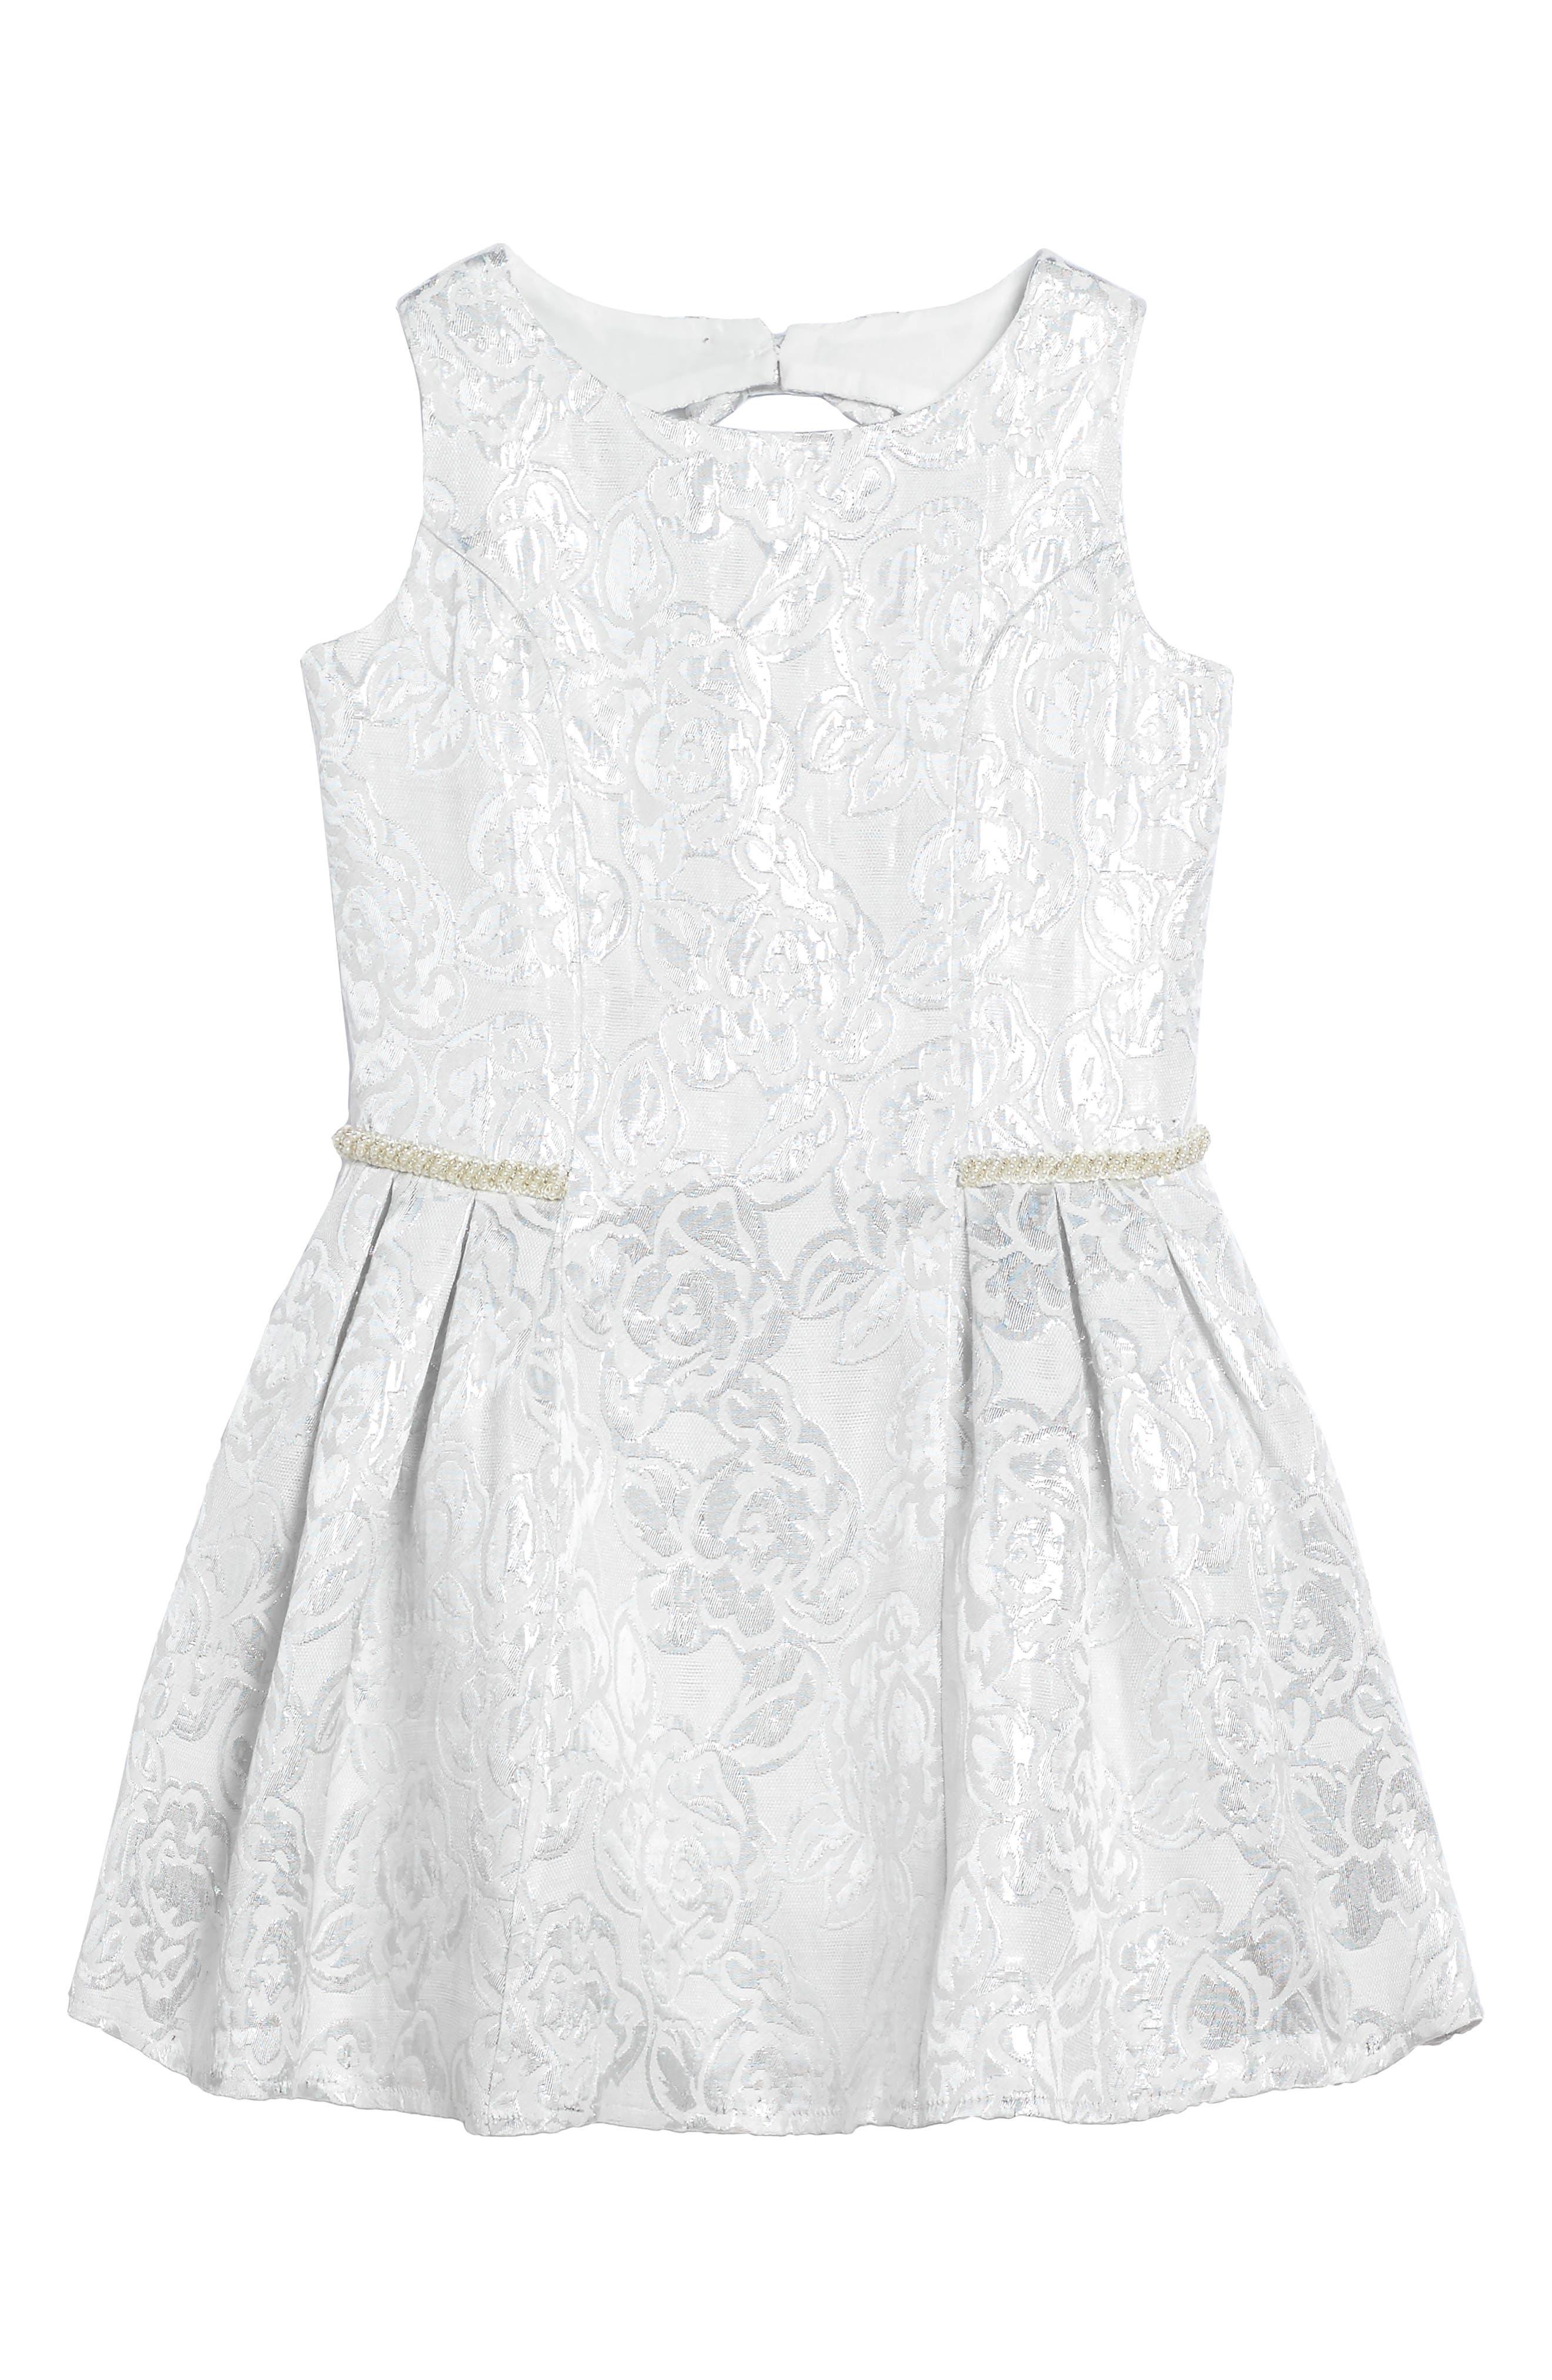 Princess Embroidered Dress,                             Main thumbnail 1, color,                             040